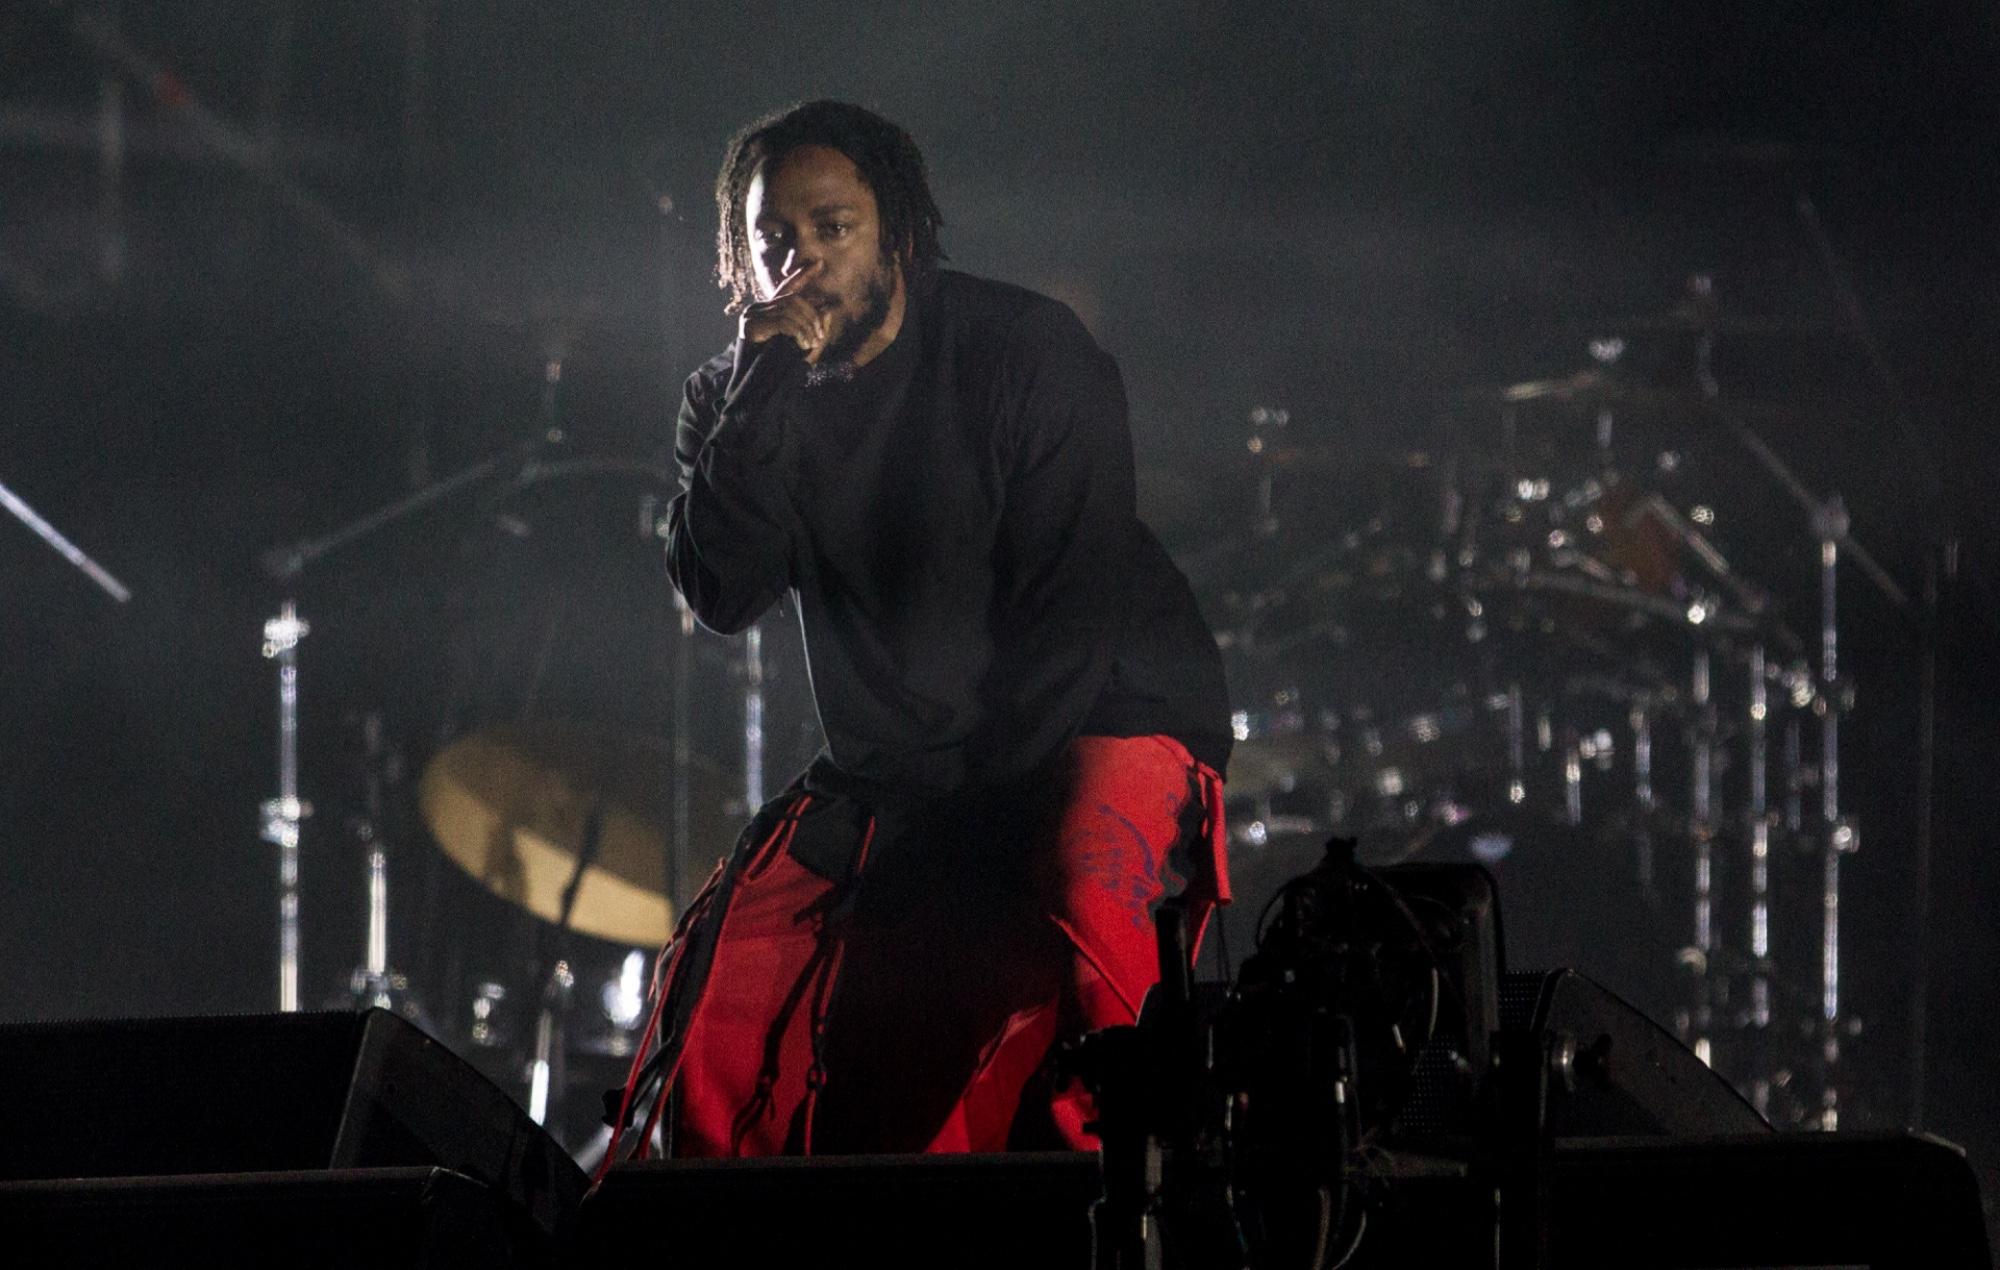 New music from Kendrick Lamar.